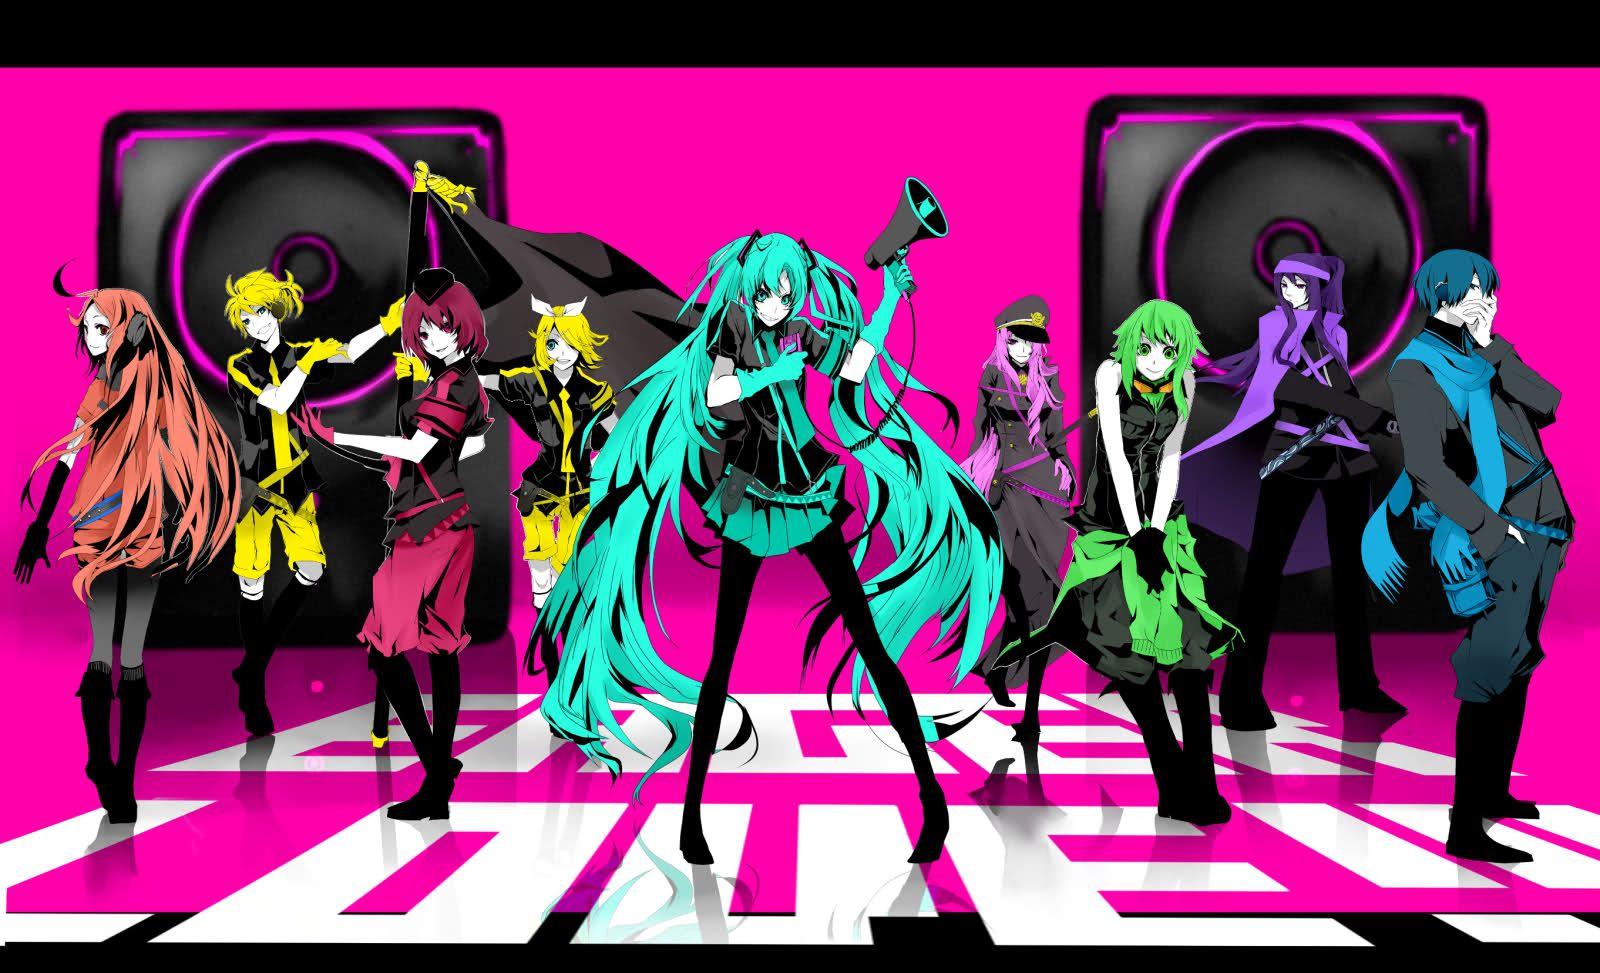 Anime Vocaloid Love Is War Song Illustration Miku Hatsune